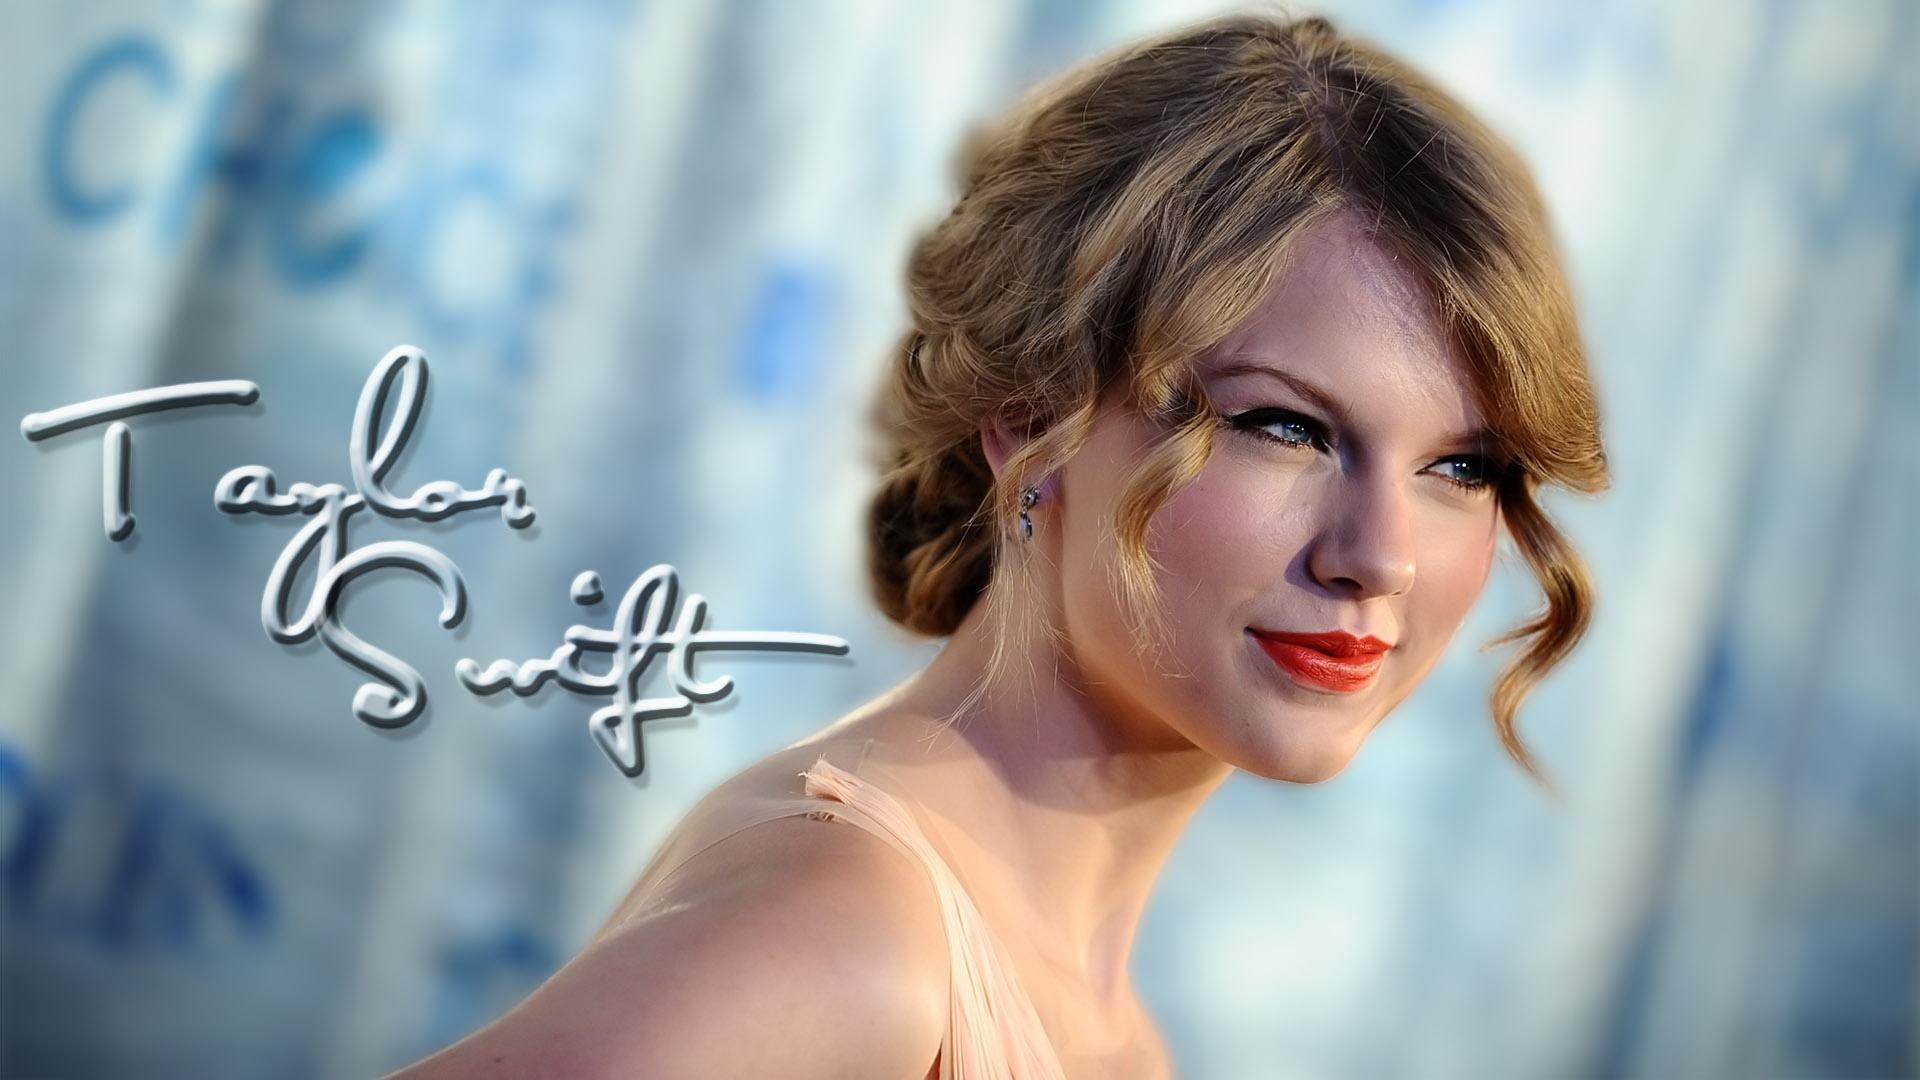 Lovely Taylor Wallpaper Swift 26240296 1920x1080